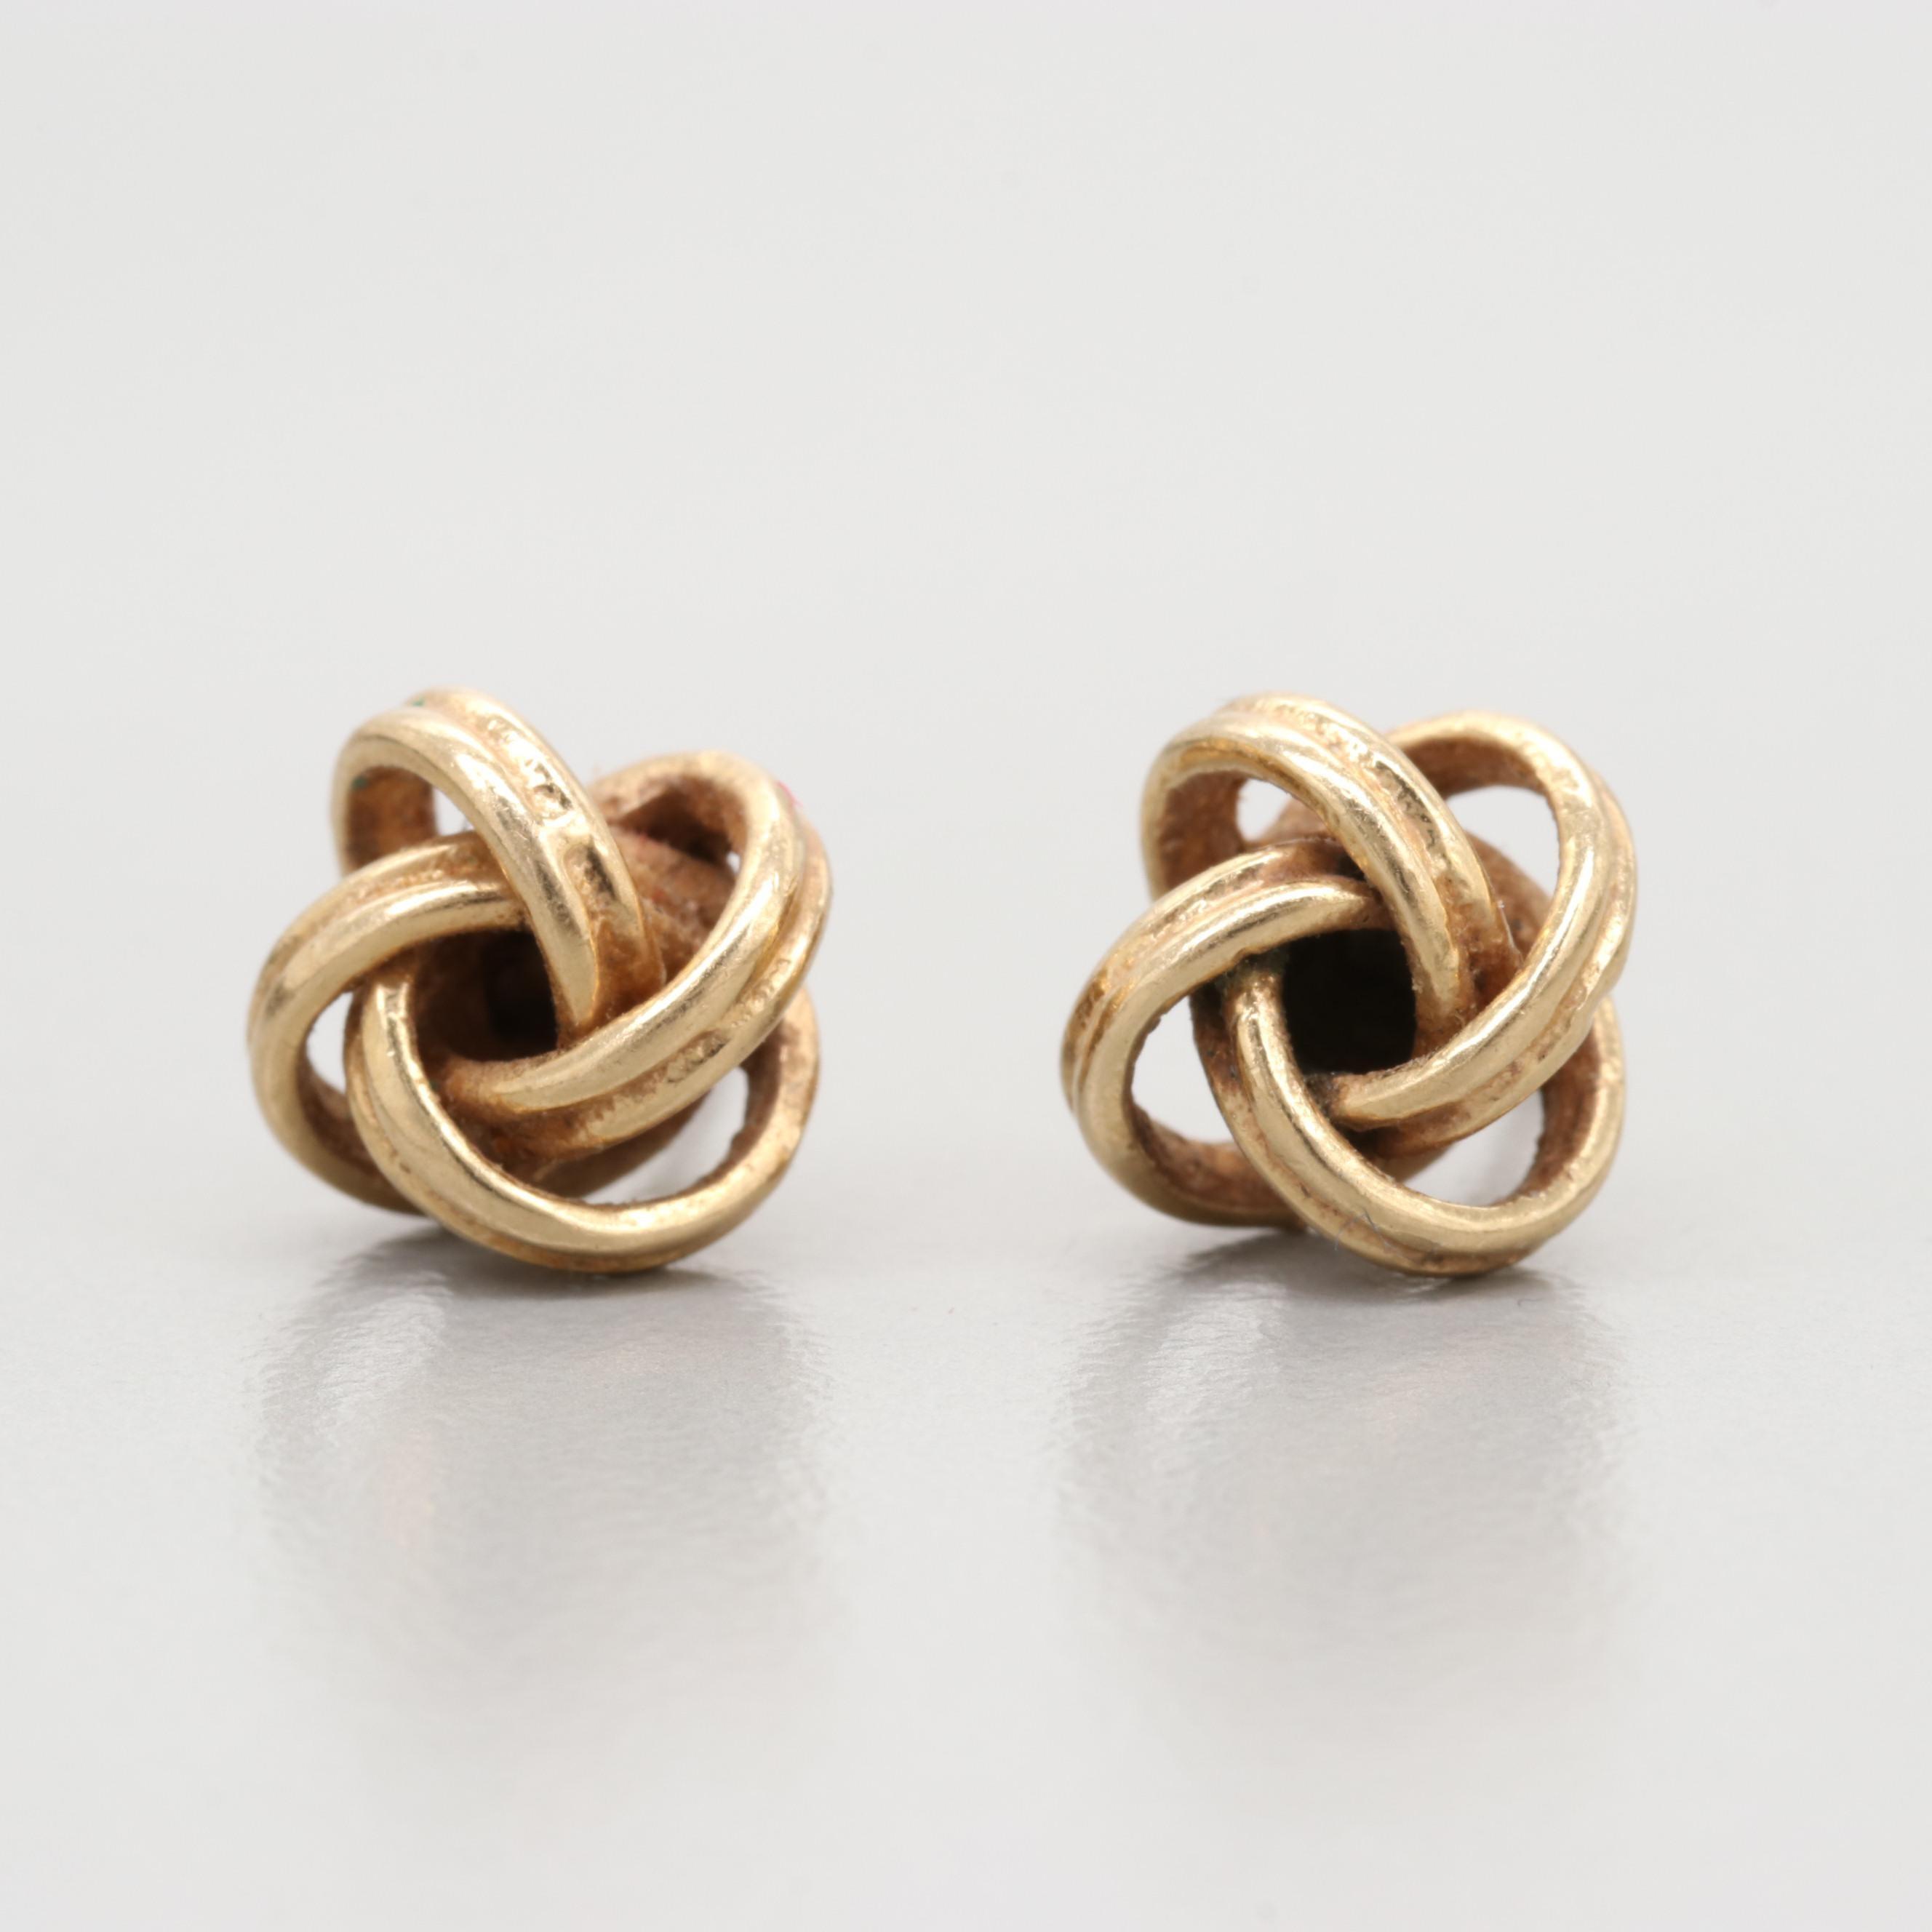 14K Yellow Gold Infinity Knot Earrings